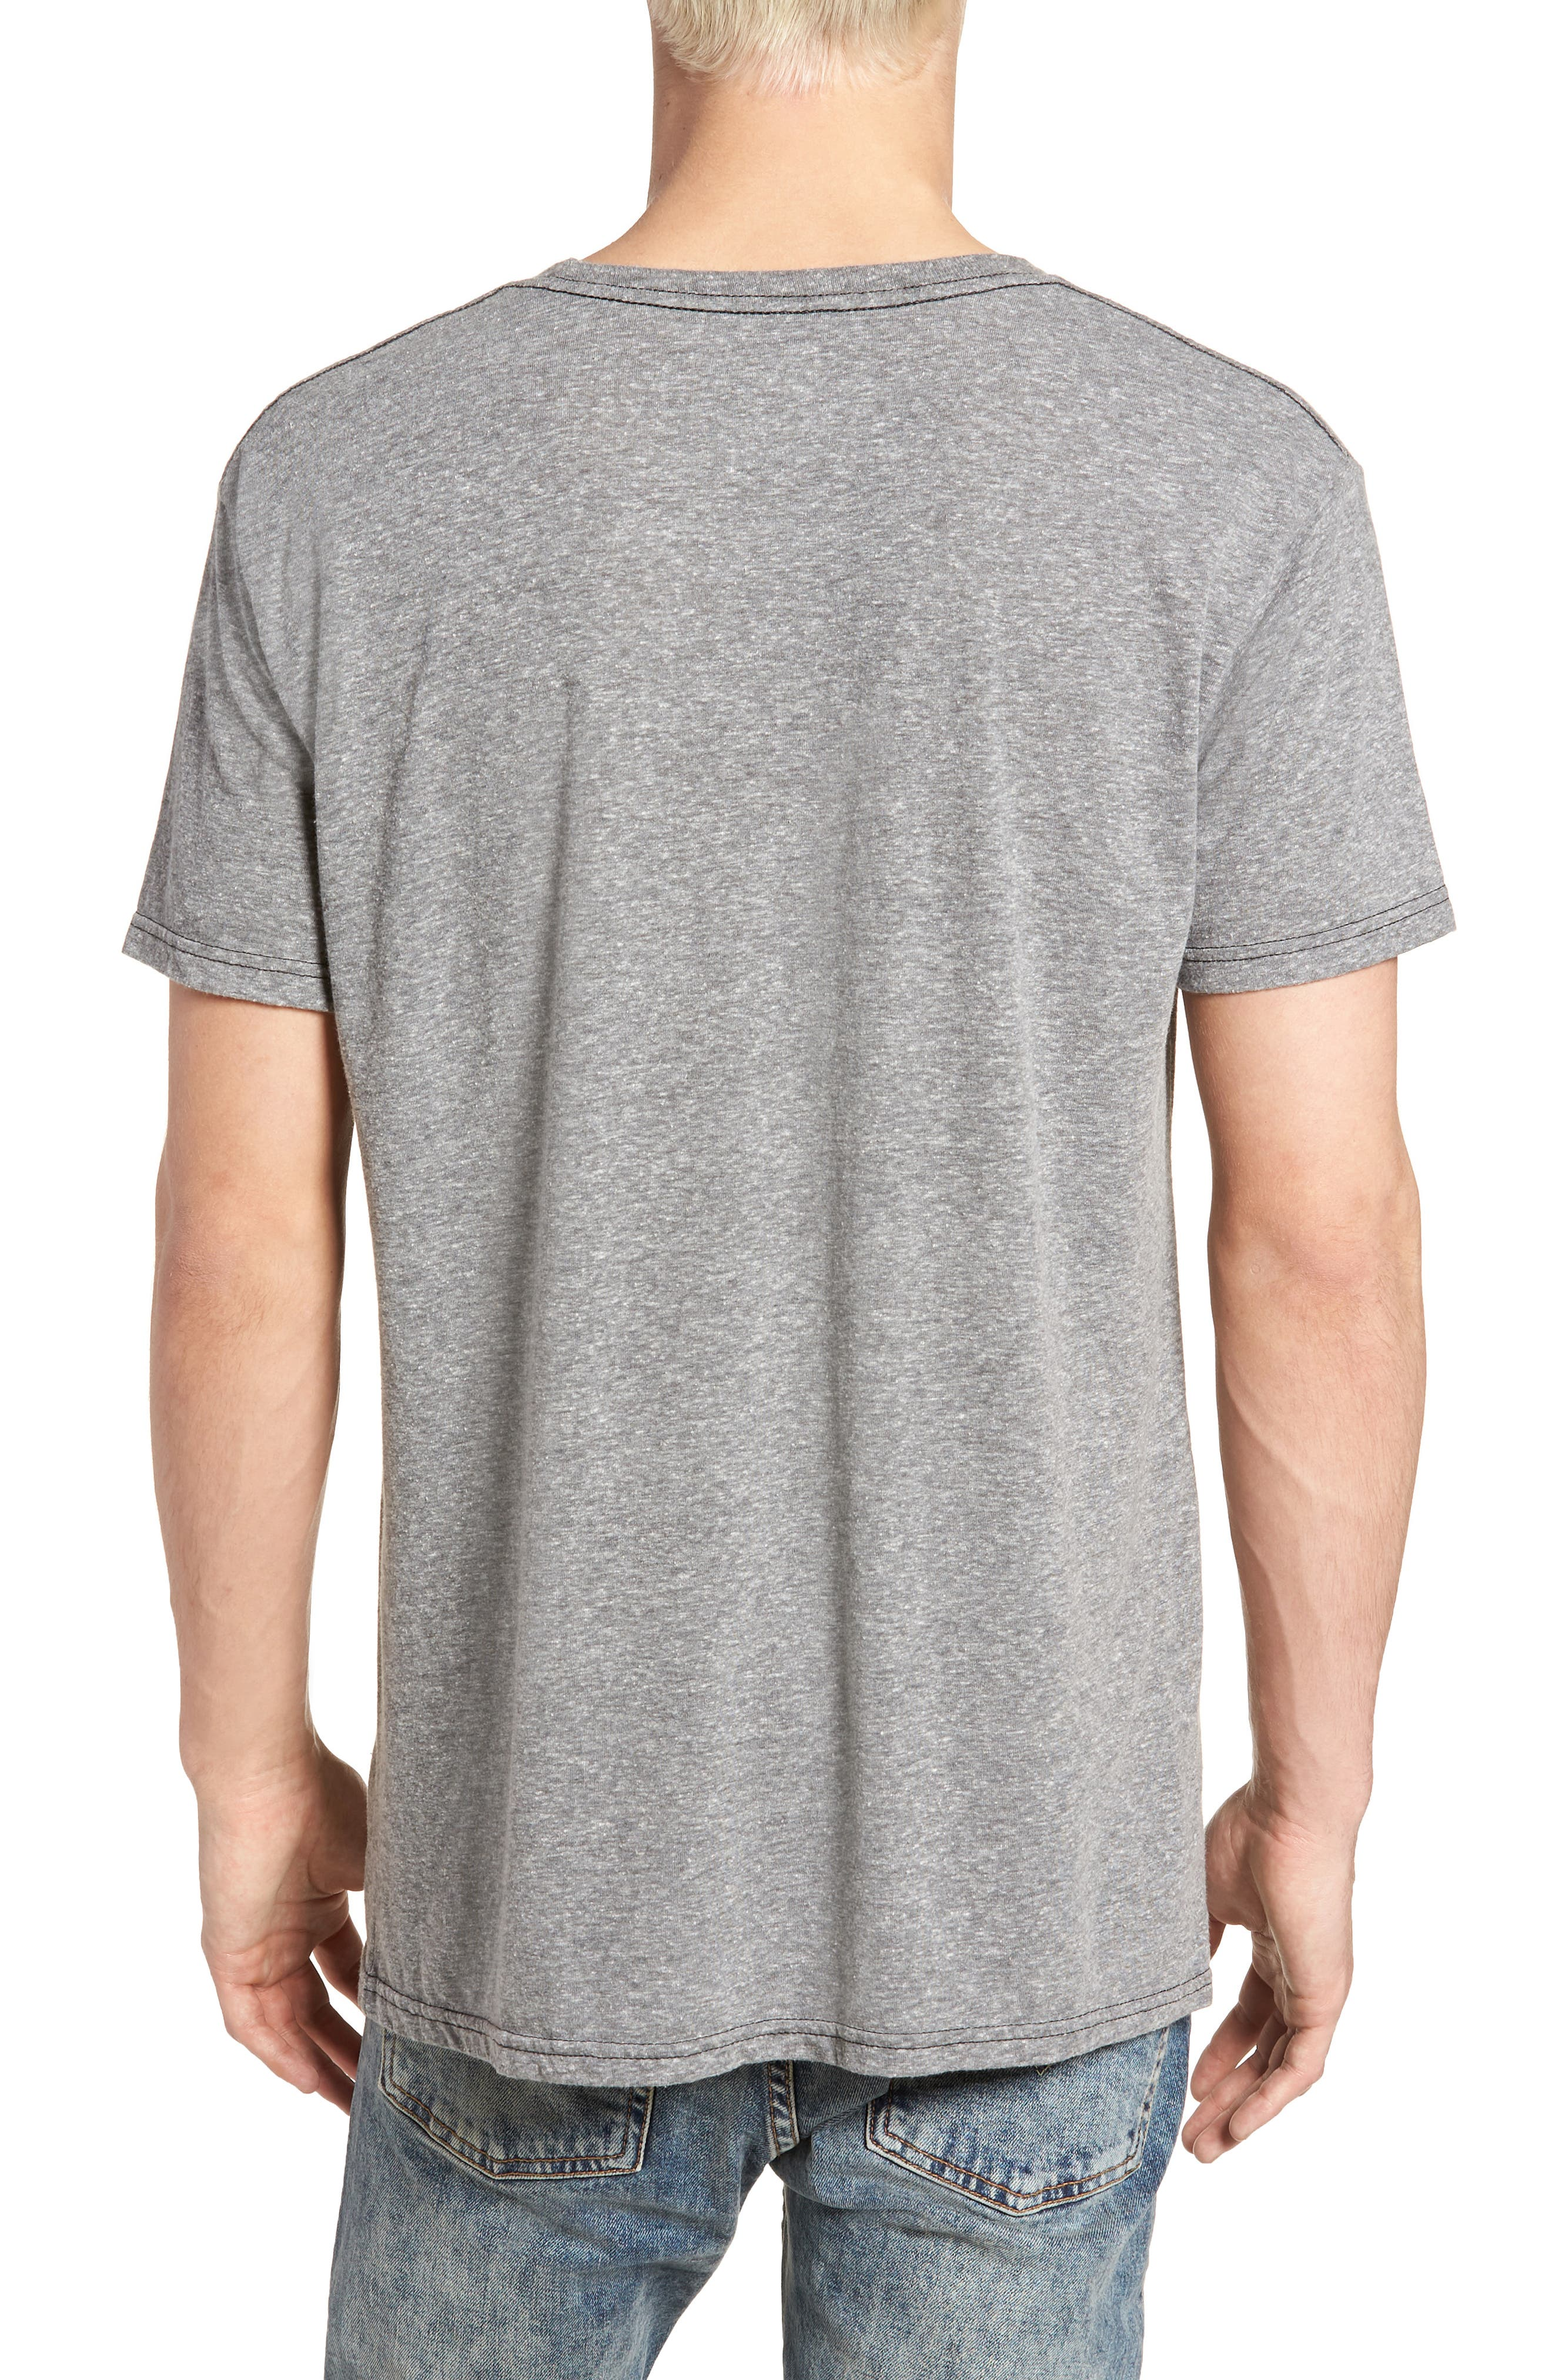 Original Retro Brand Silver Bullet Graphic T-Shirt,                             Alternate thumbnail 2, color,                             Streaky Grey